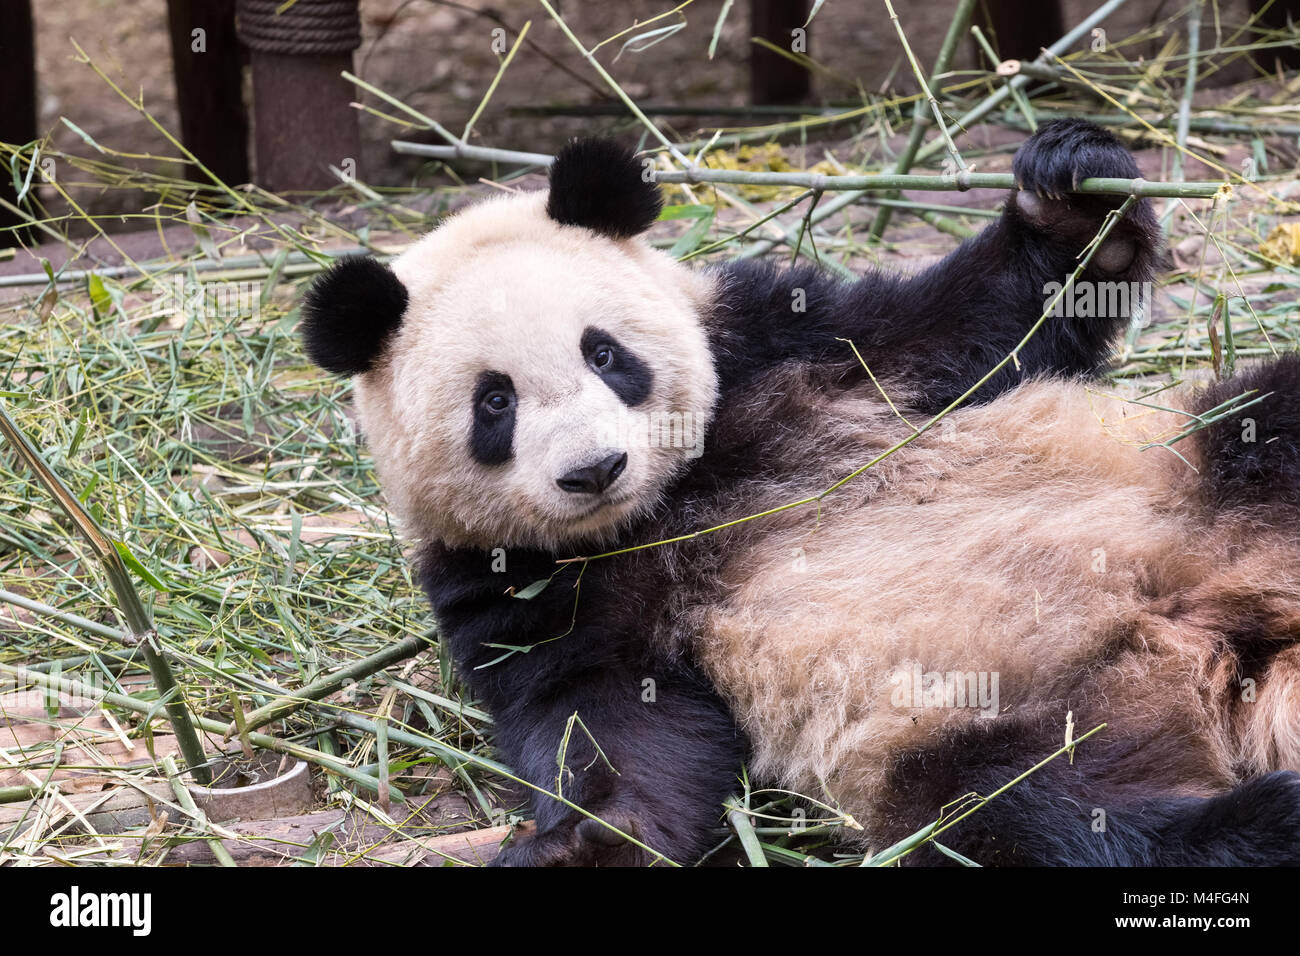 cute giant panda - Stock Image